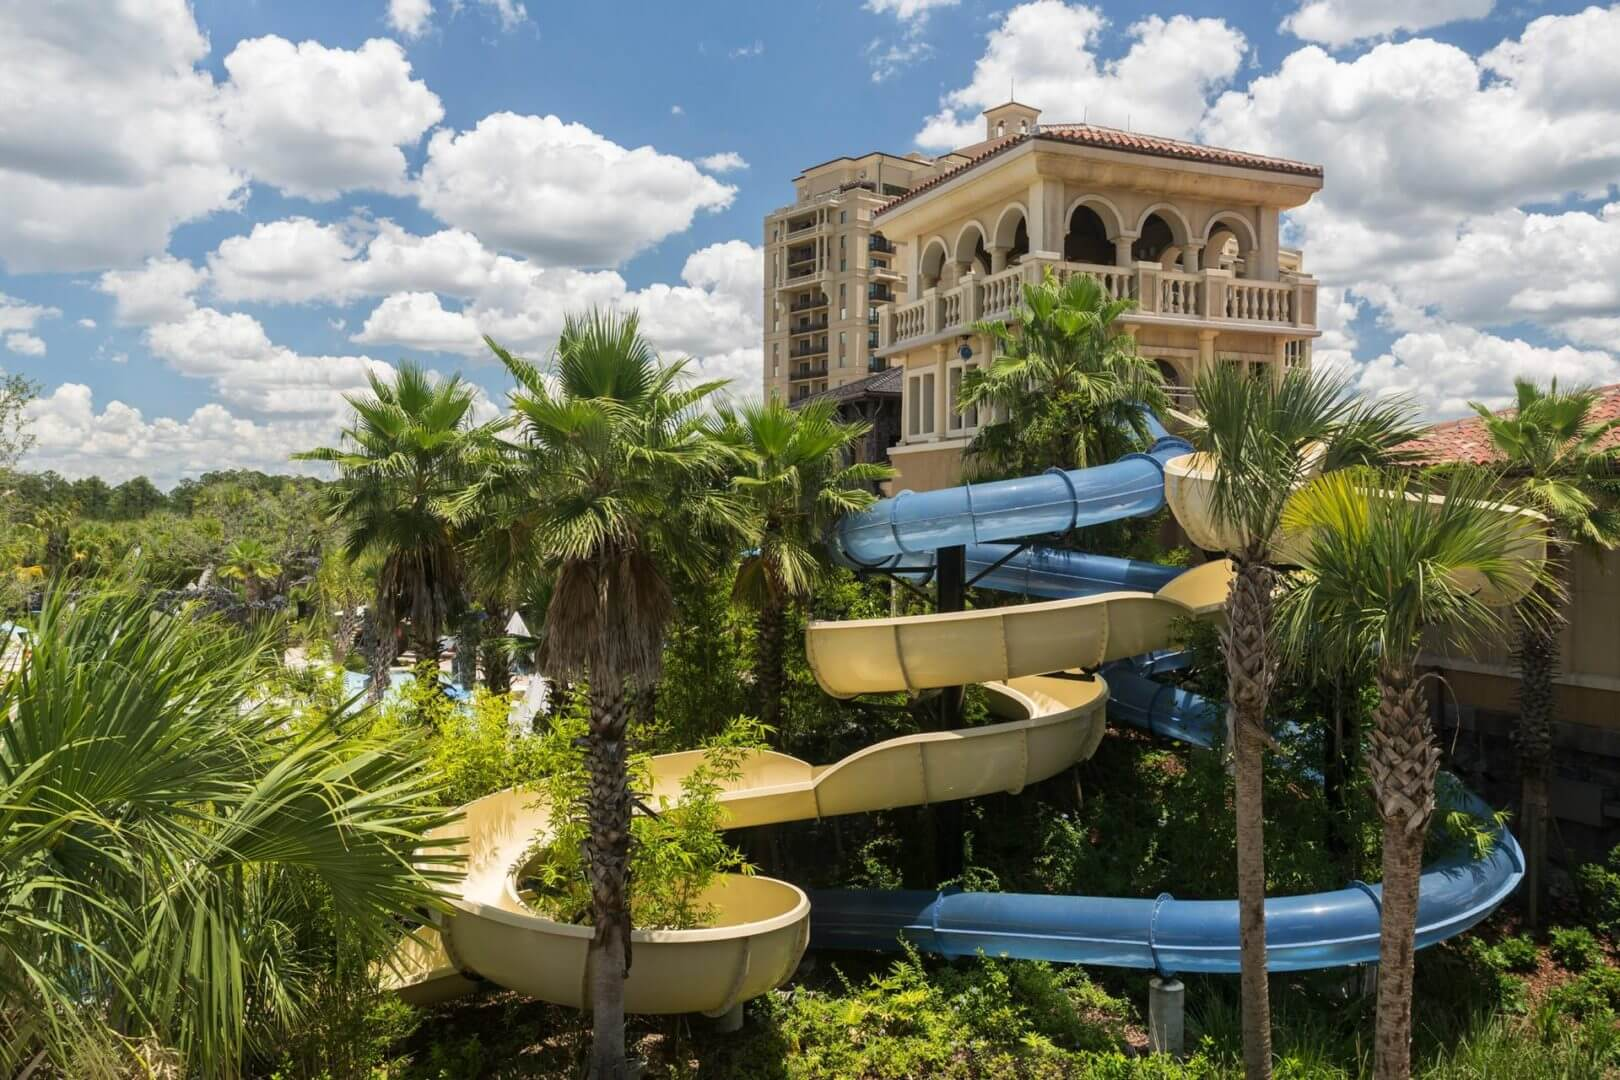 Four seasons now selling homes at walt disney world for Fourseason hotel